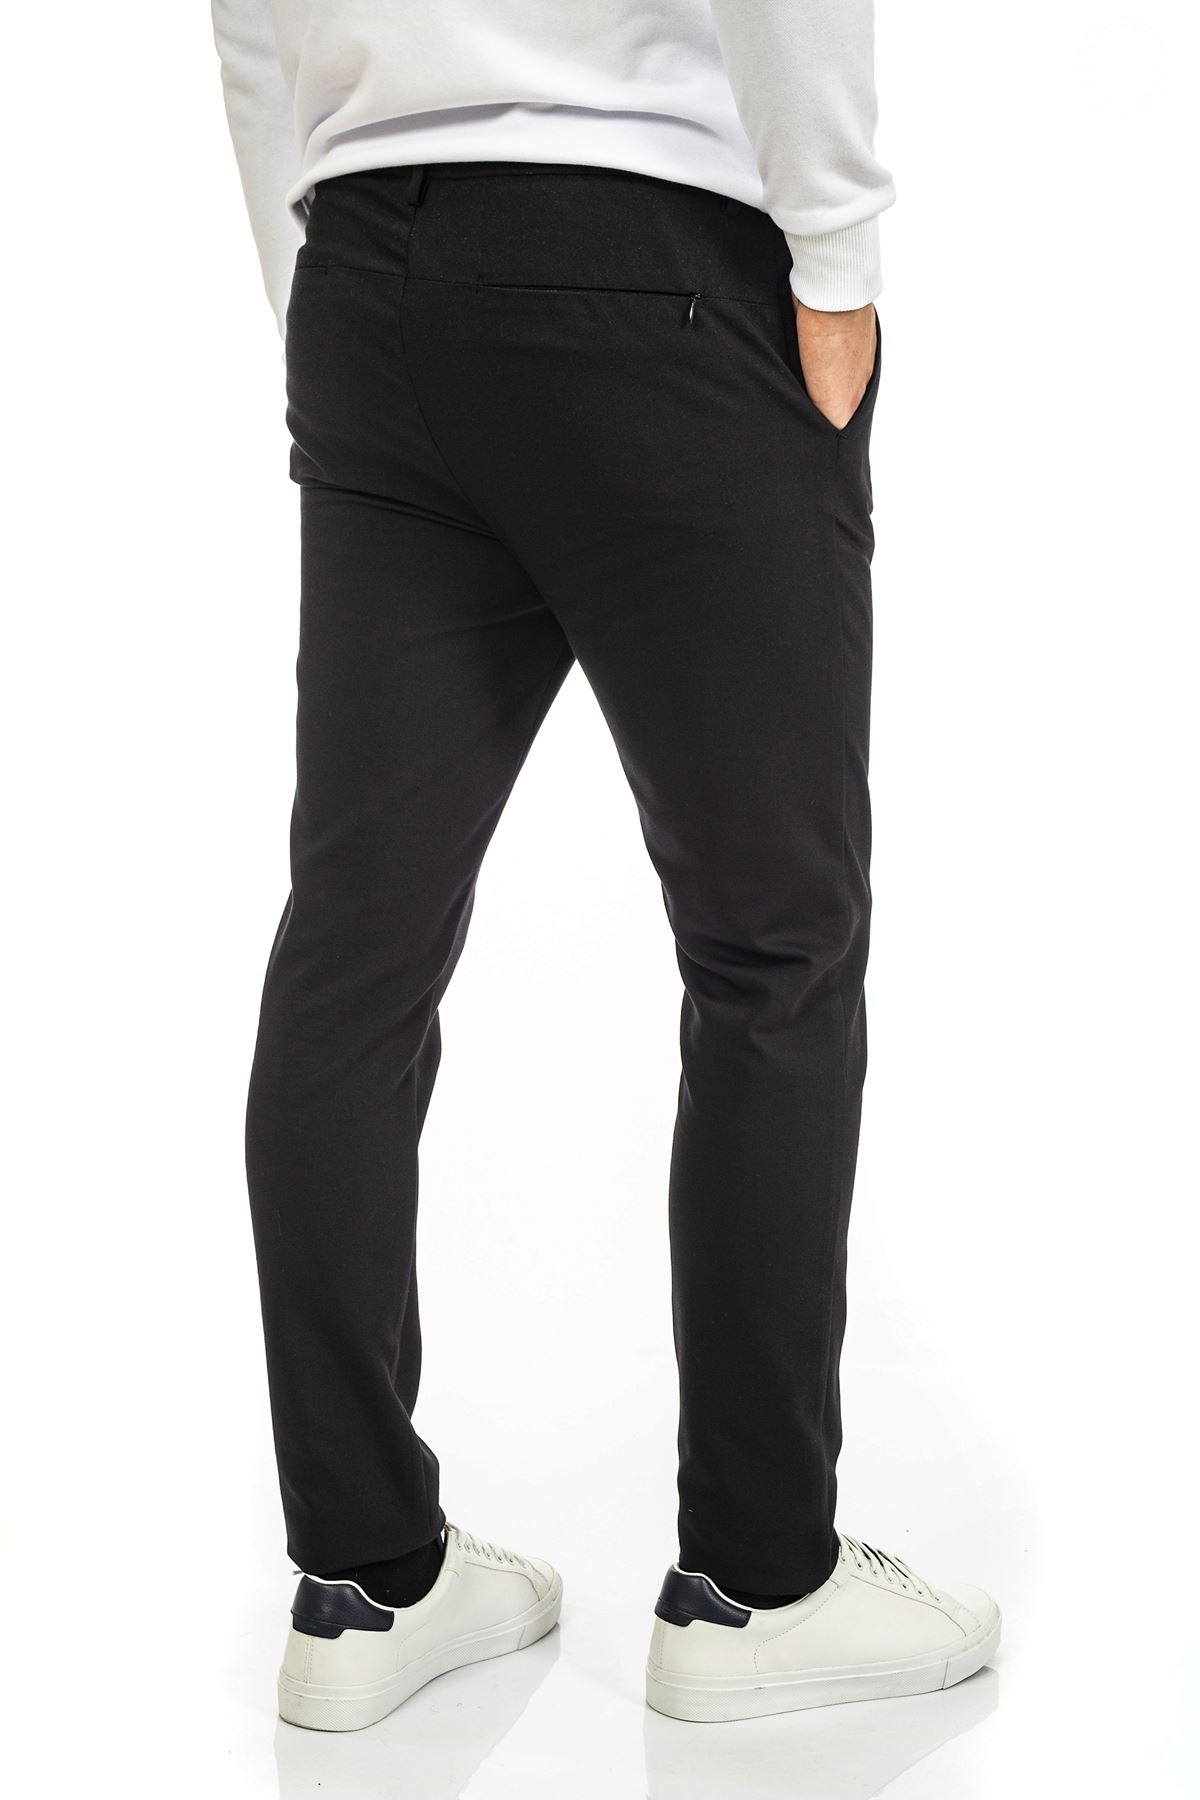 Siyah Bağcıklı Jogger Spor Pantolon